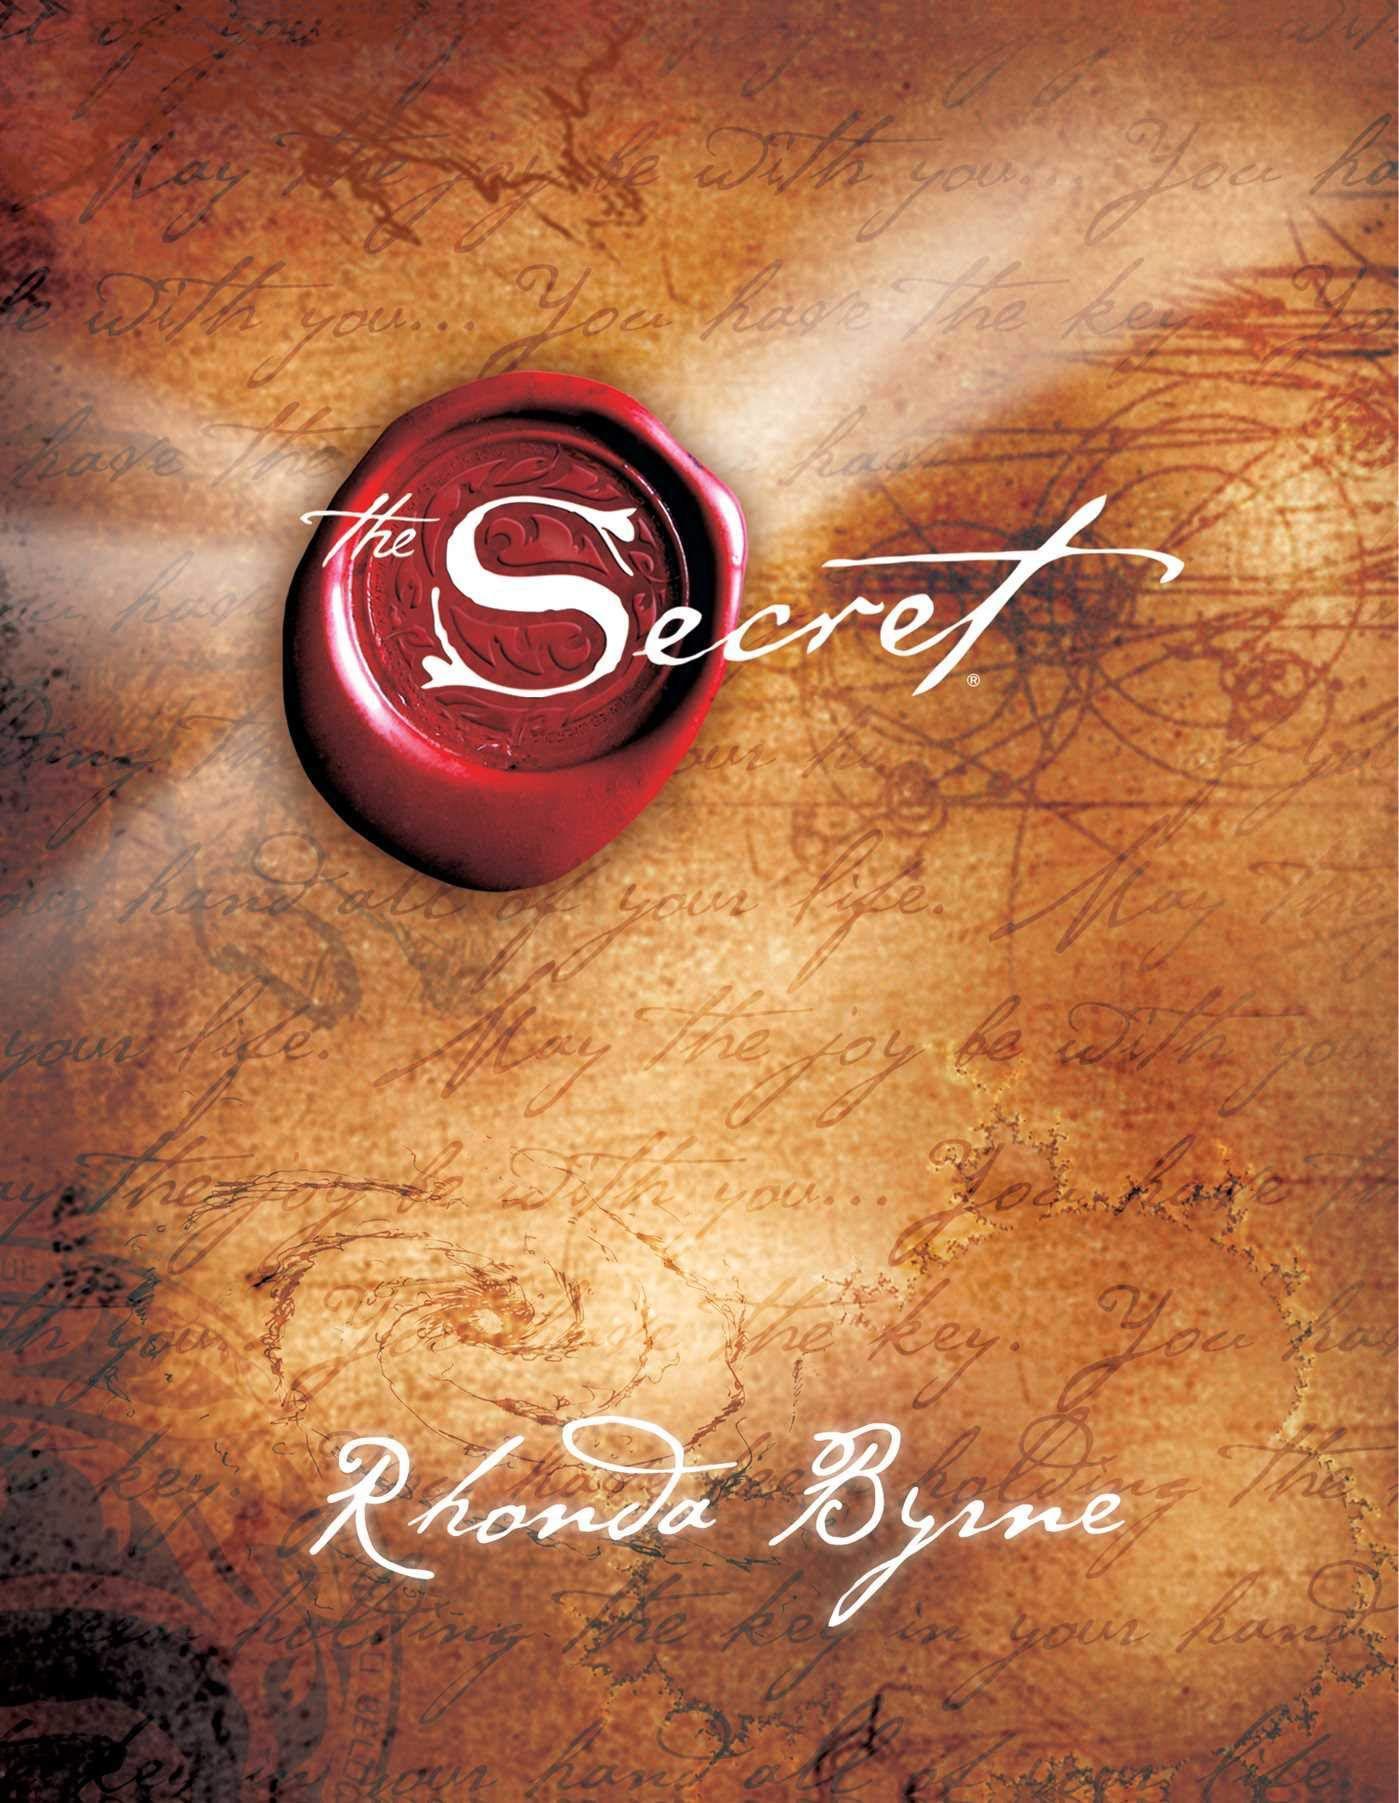 Le Secret De Rhonda Byrne : secret, rhonda, byrne, Review, Secret, Rhonda, Byrne